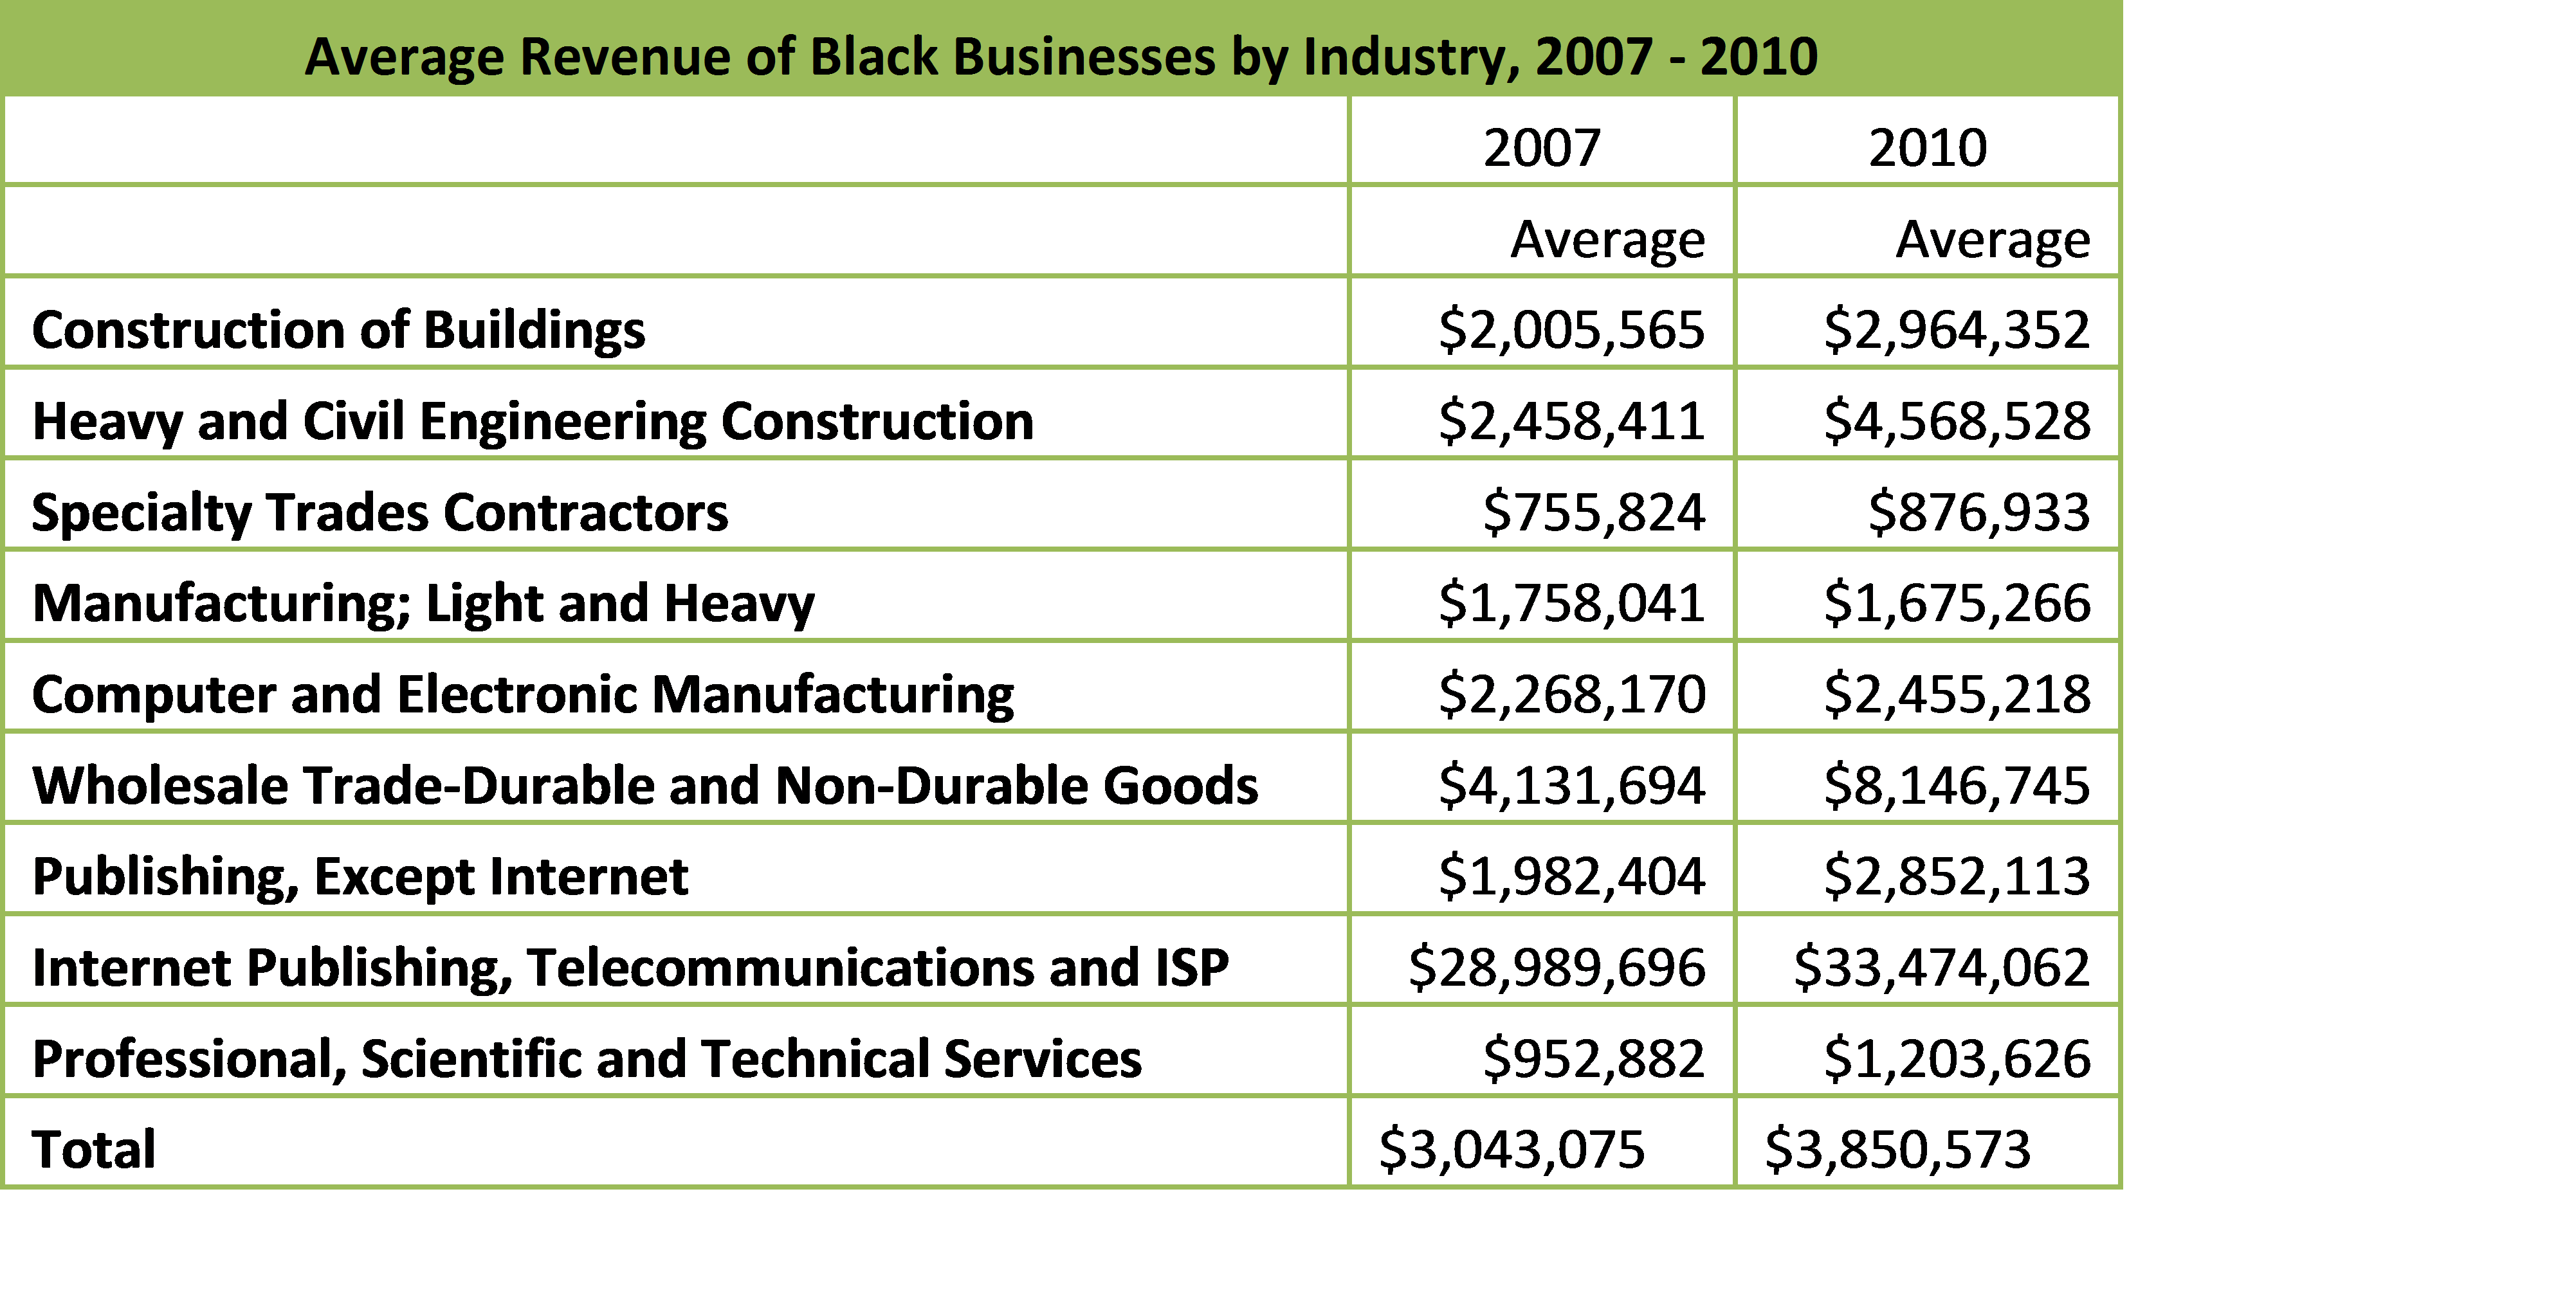 www.euquant.c – Black Business Performance, 2007 – 2010